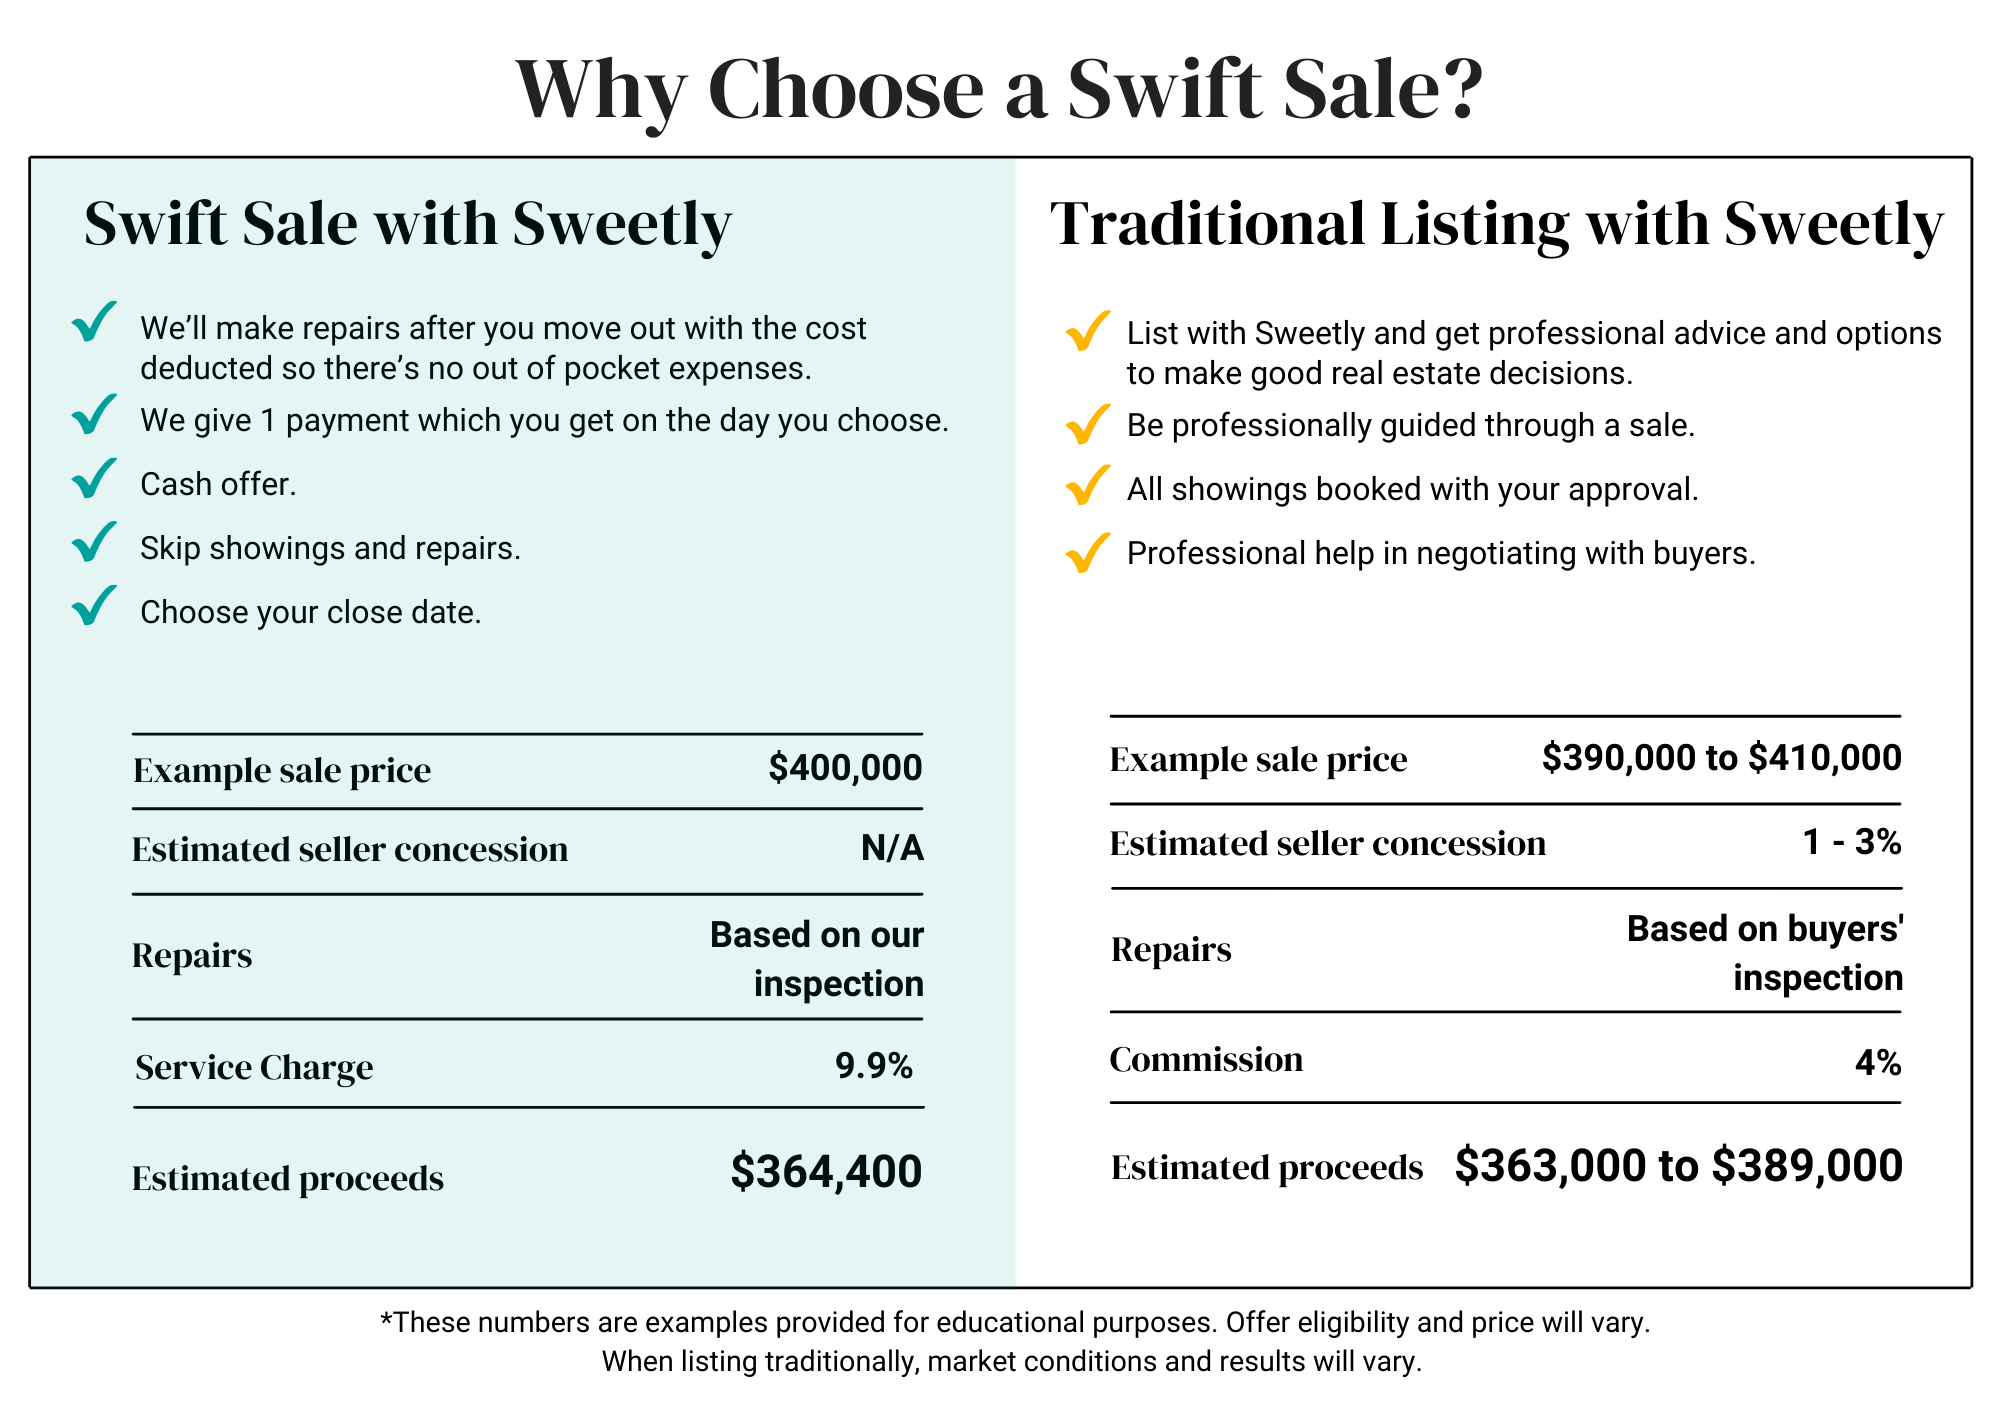 Why Choose a Swift Sale?